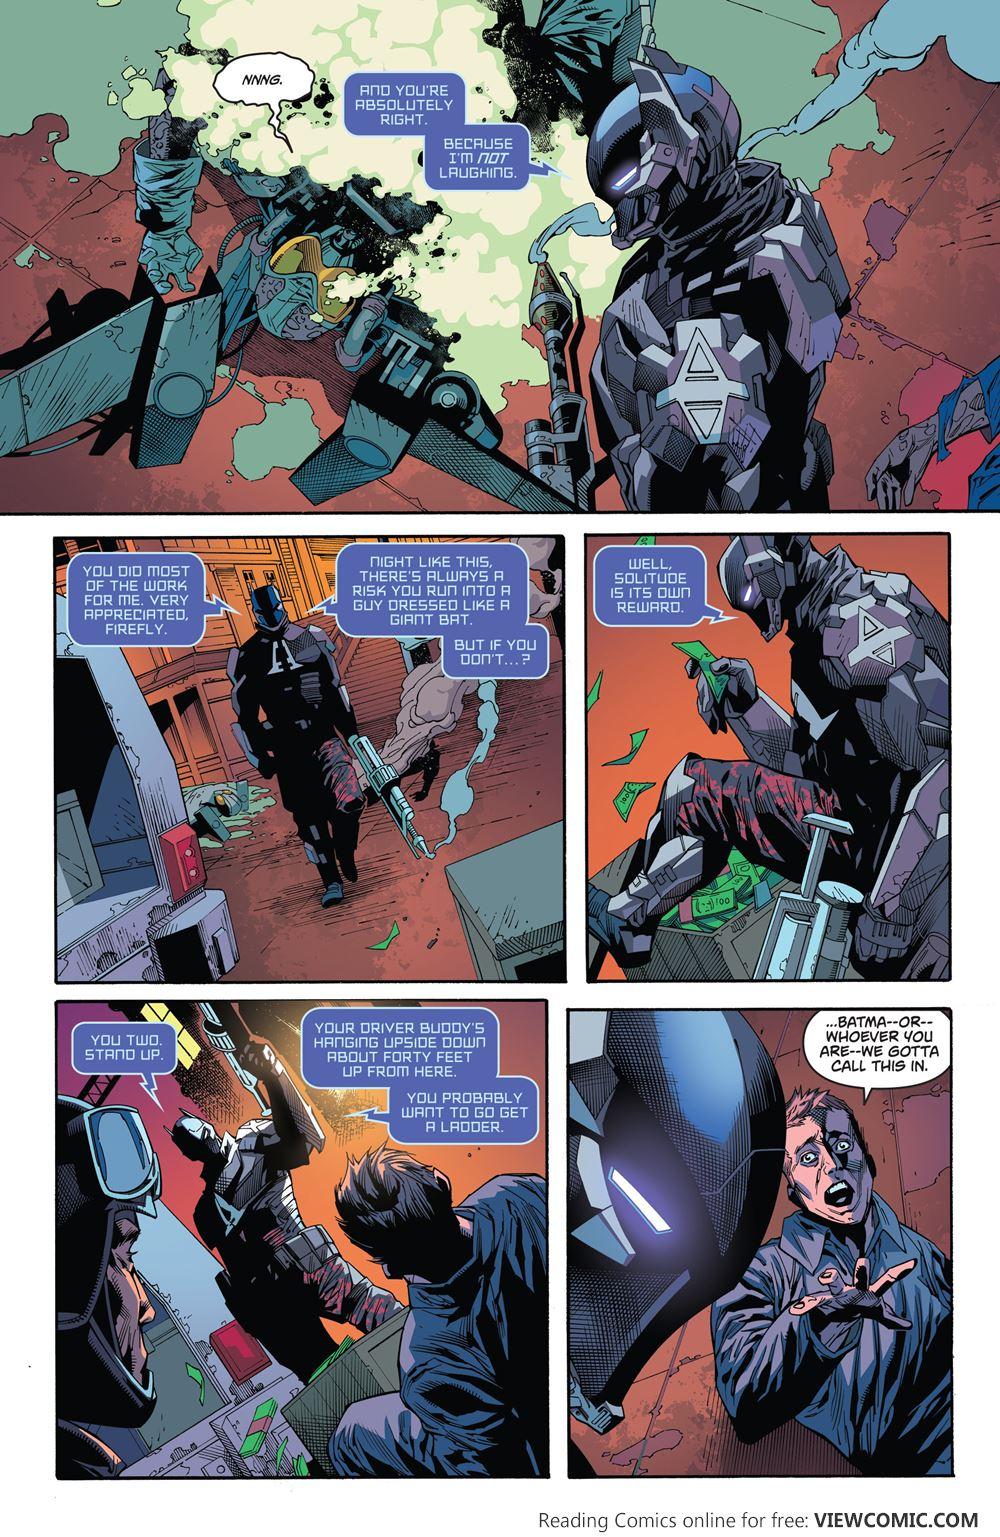 Batman – Arkham Knight Annual 001 (2015) | Viewcomic reading comics